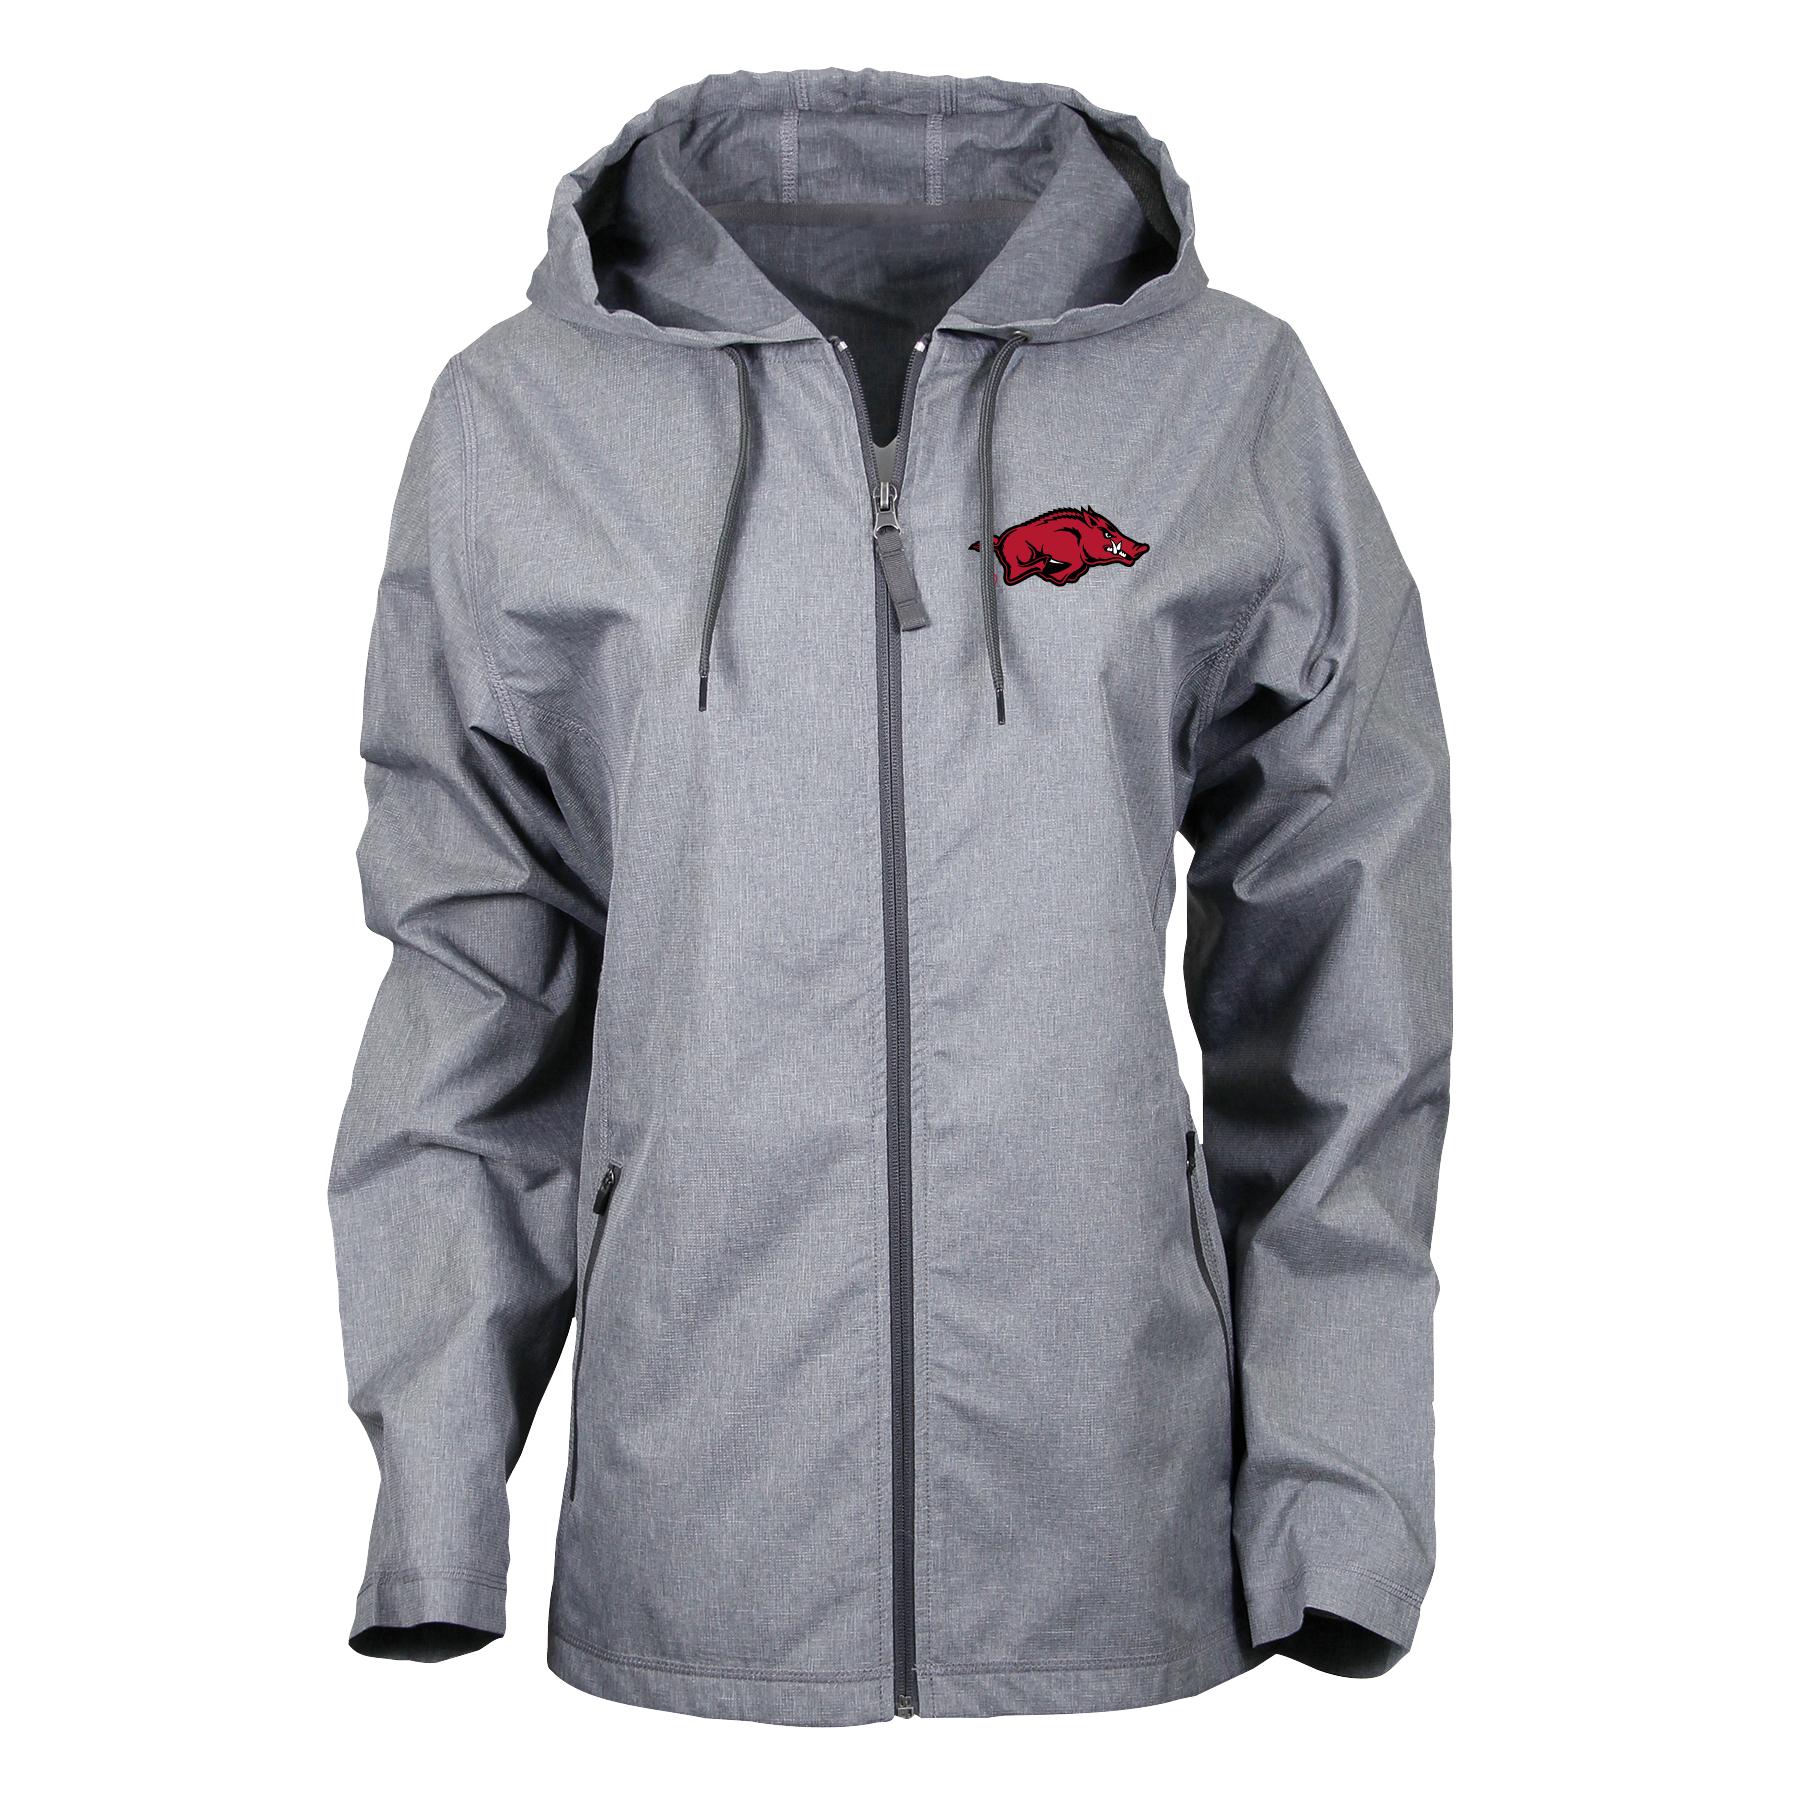 W Venture Jacket RH